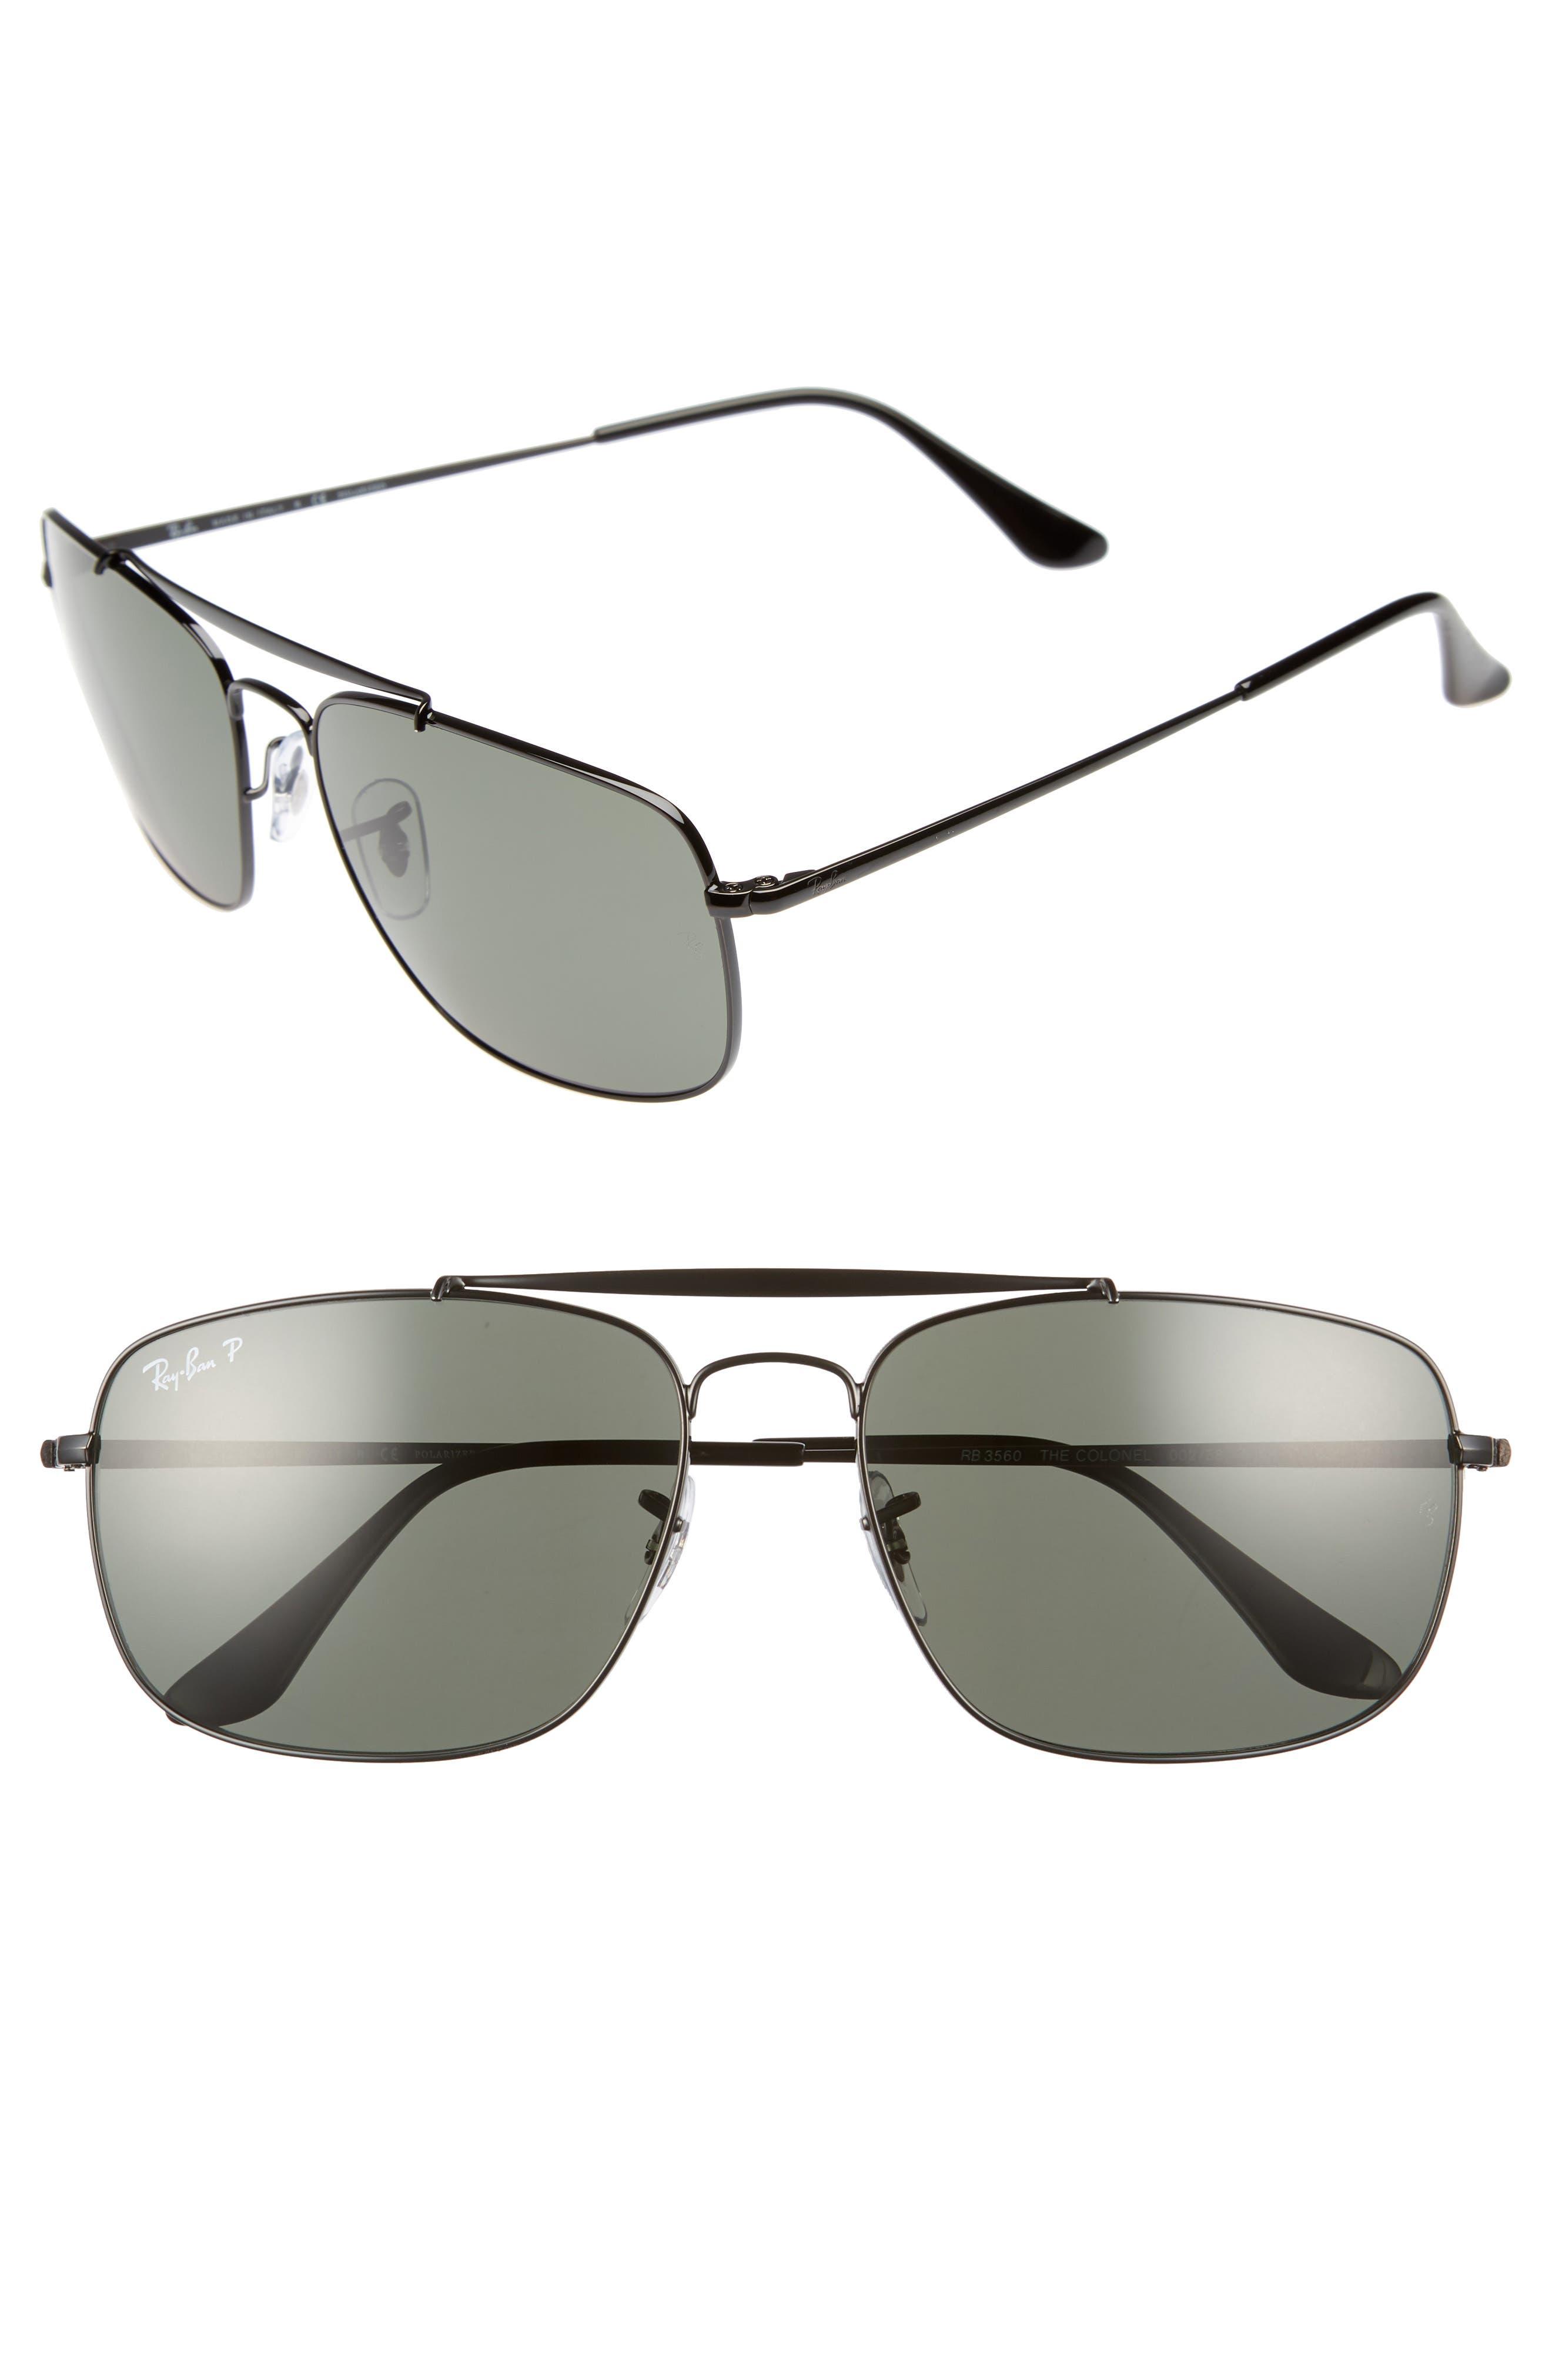 Ray-Ban The Colonel Square 61mm Polarized Sunglasses